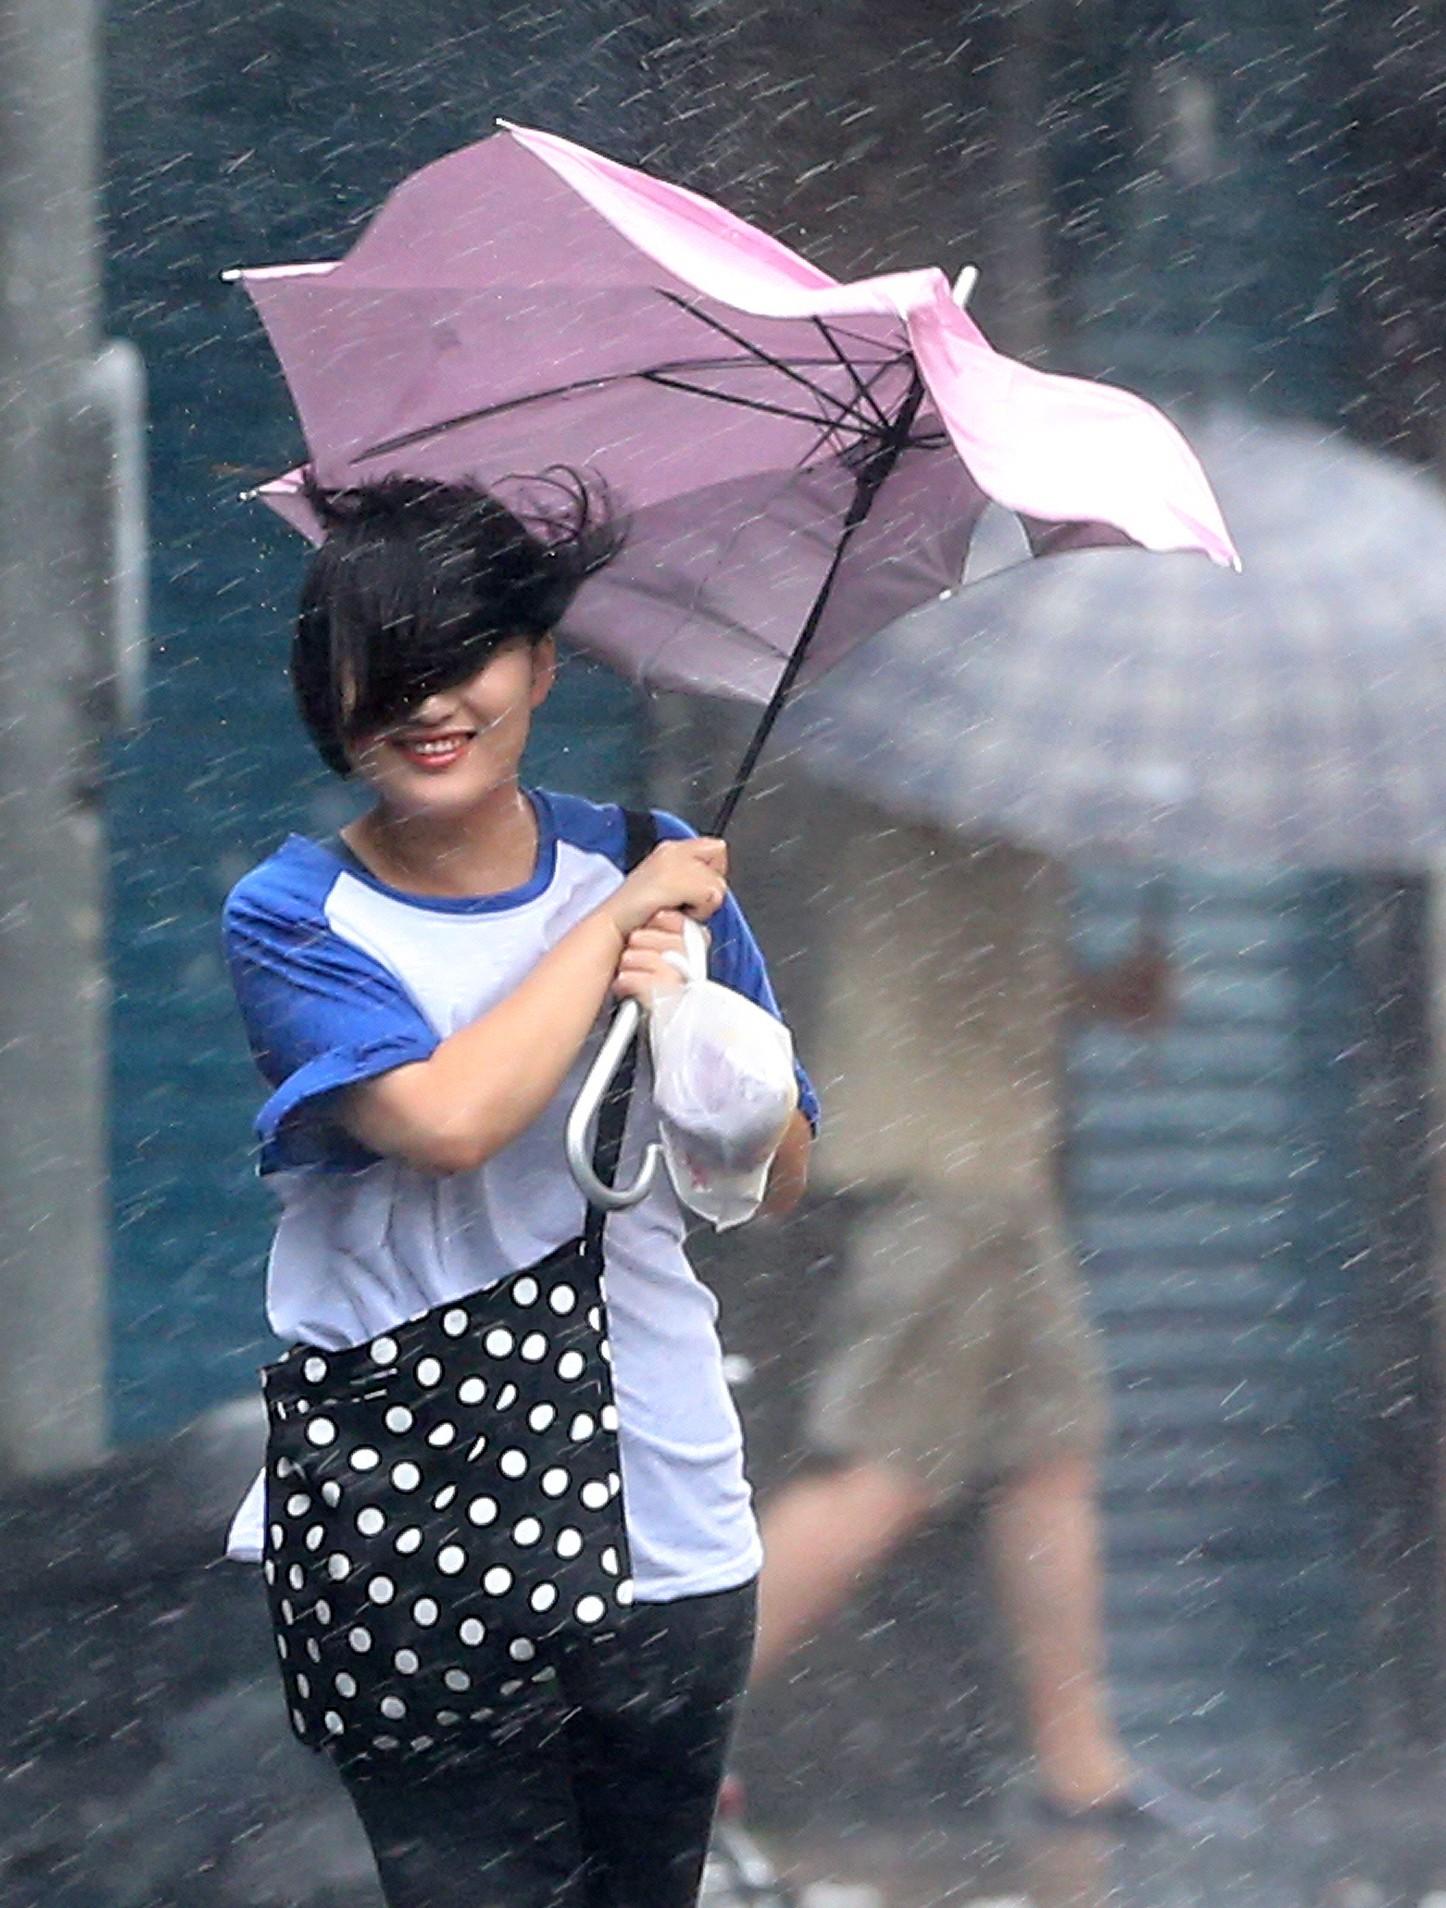 Тайфун в Тайване